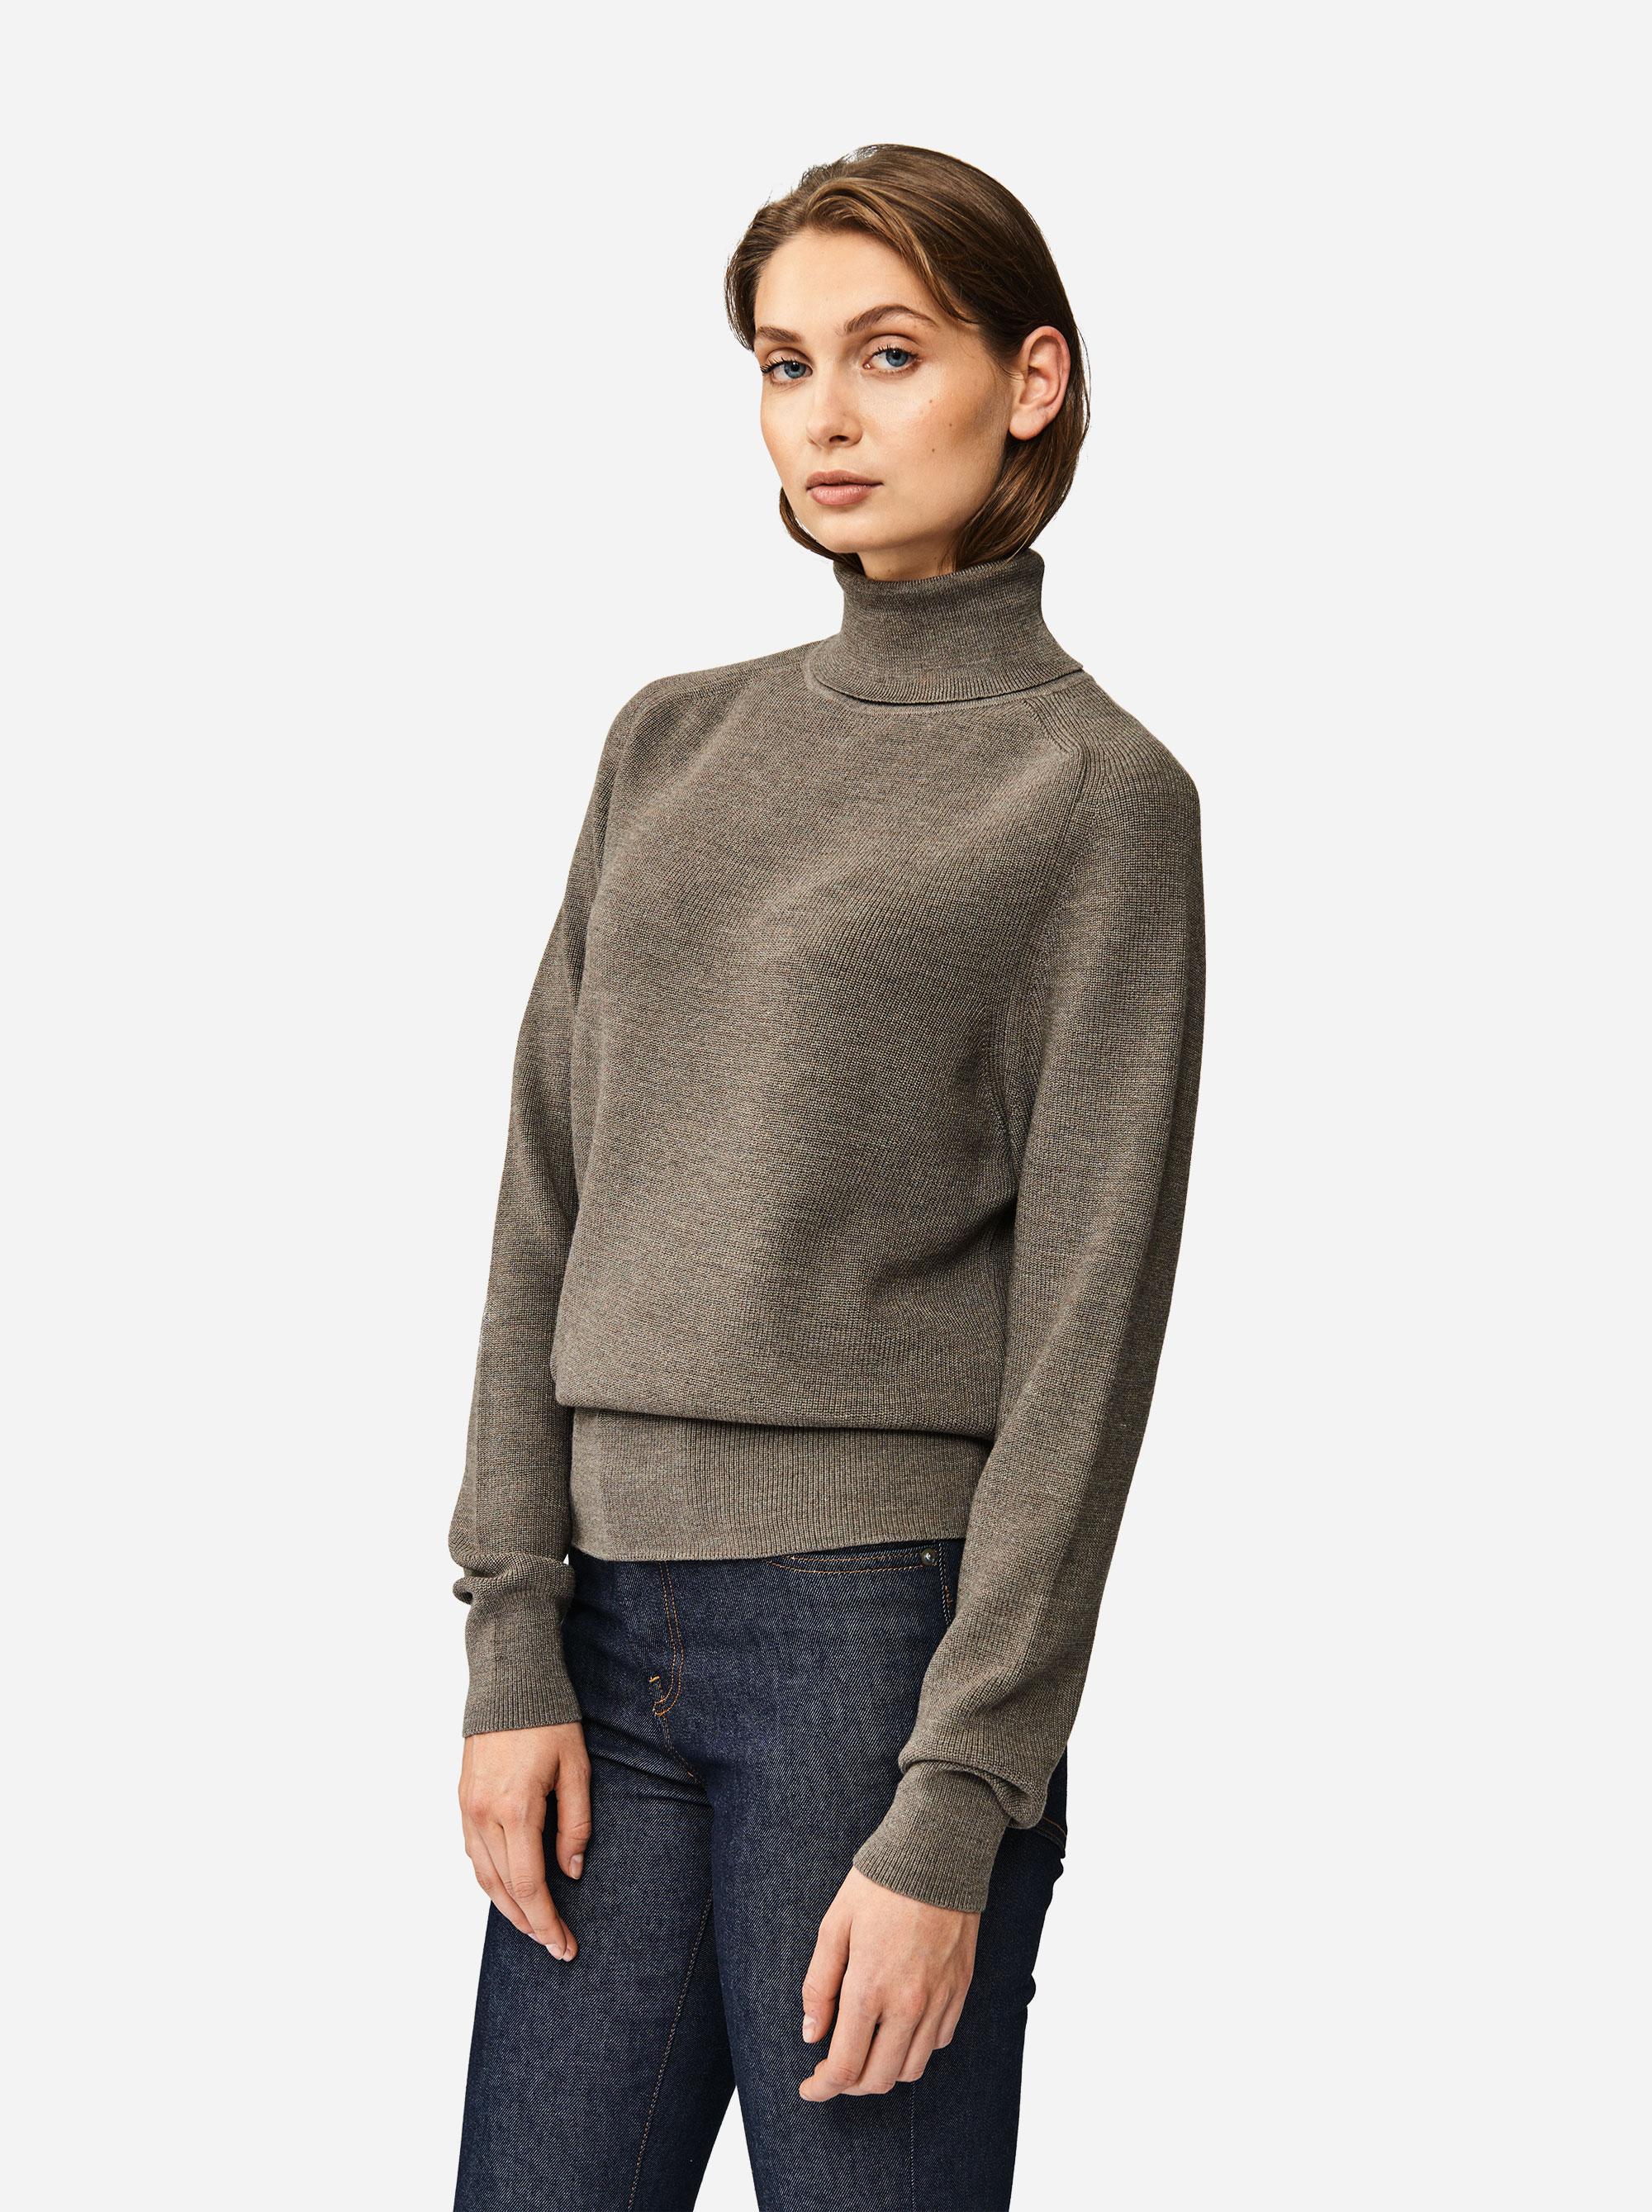 Teym - Turtleneck - The Merino Sweater - Men - Grey - 2